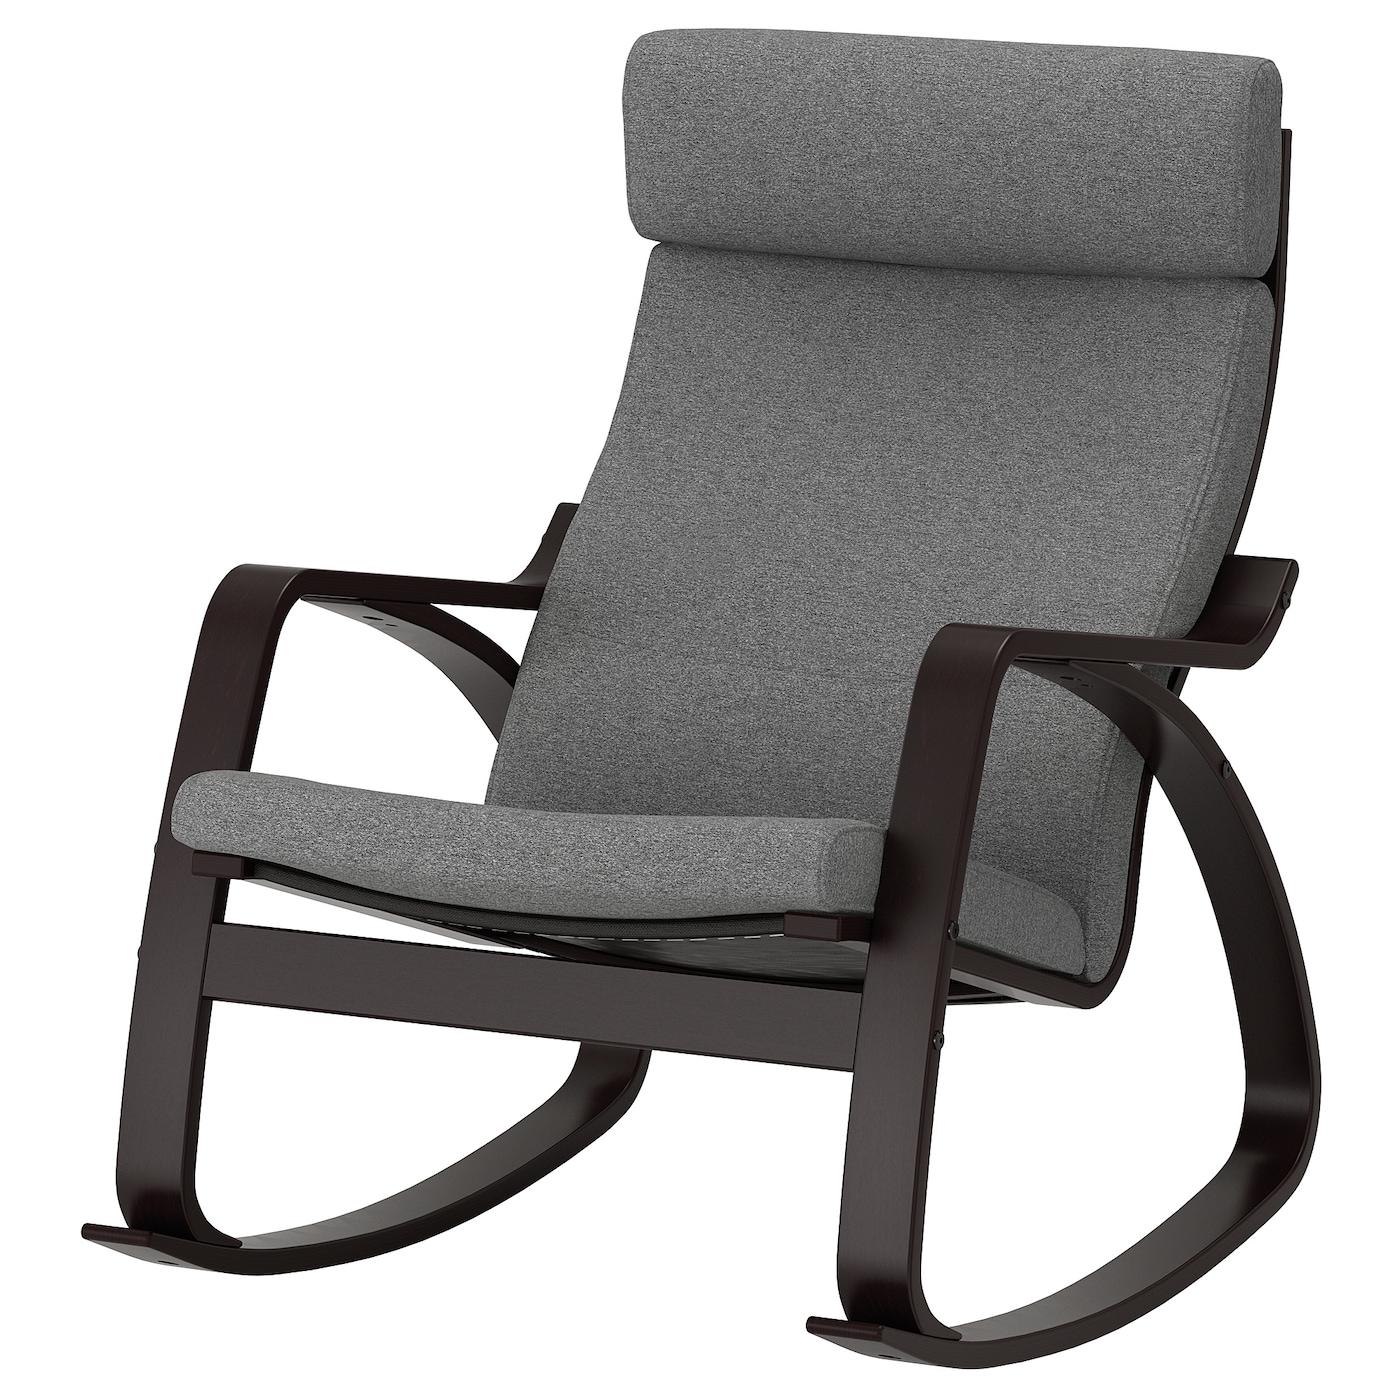 Rocking Chair Black Brown Lysed Grey